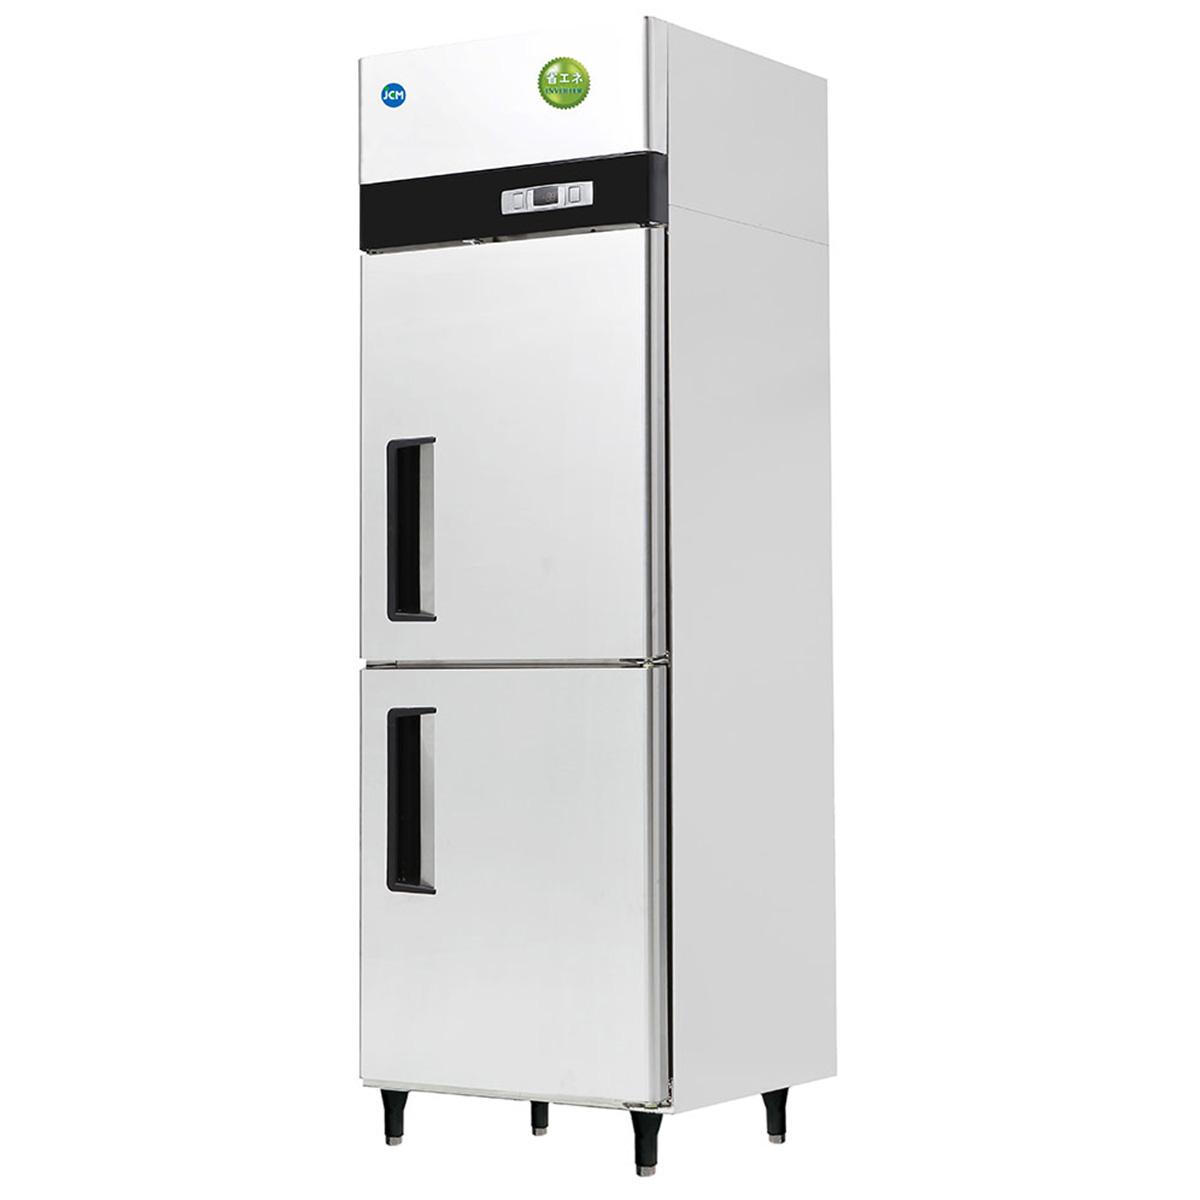 JCM タテ型 冷蔵庫 JCMR-665-I 業務用 冷蔵 2ドア 省エネ 【代引不可】